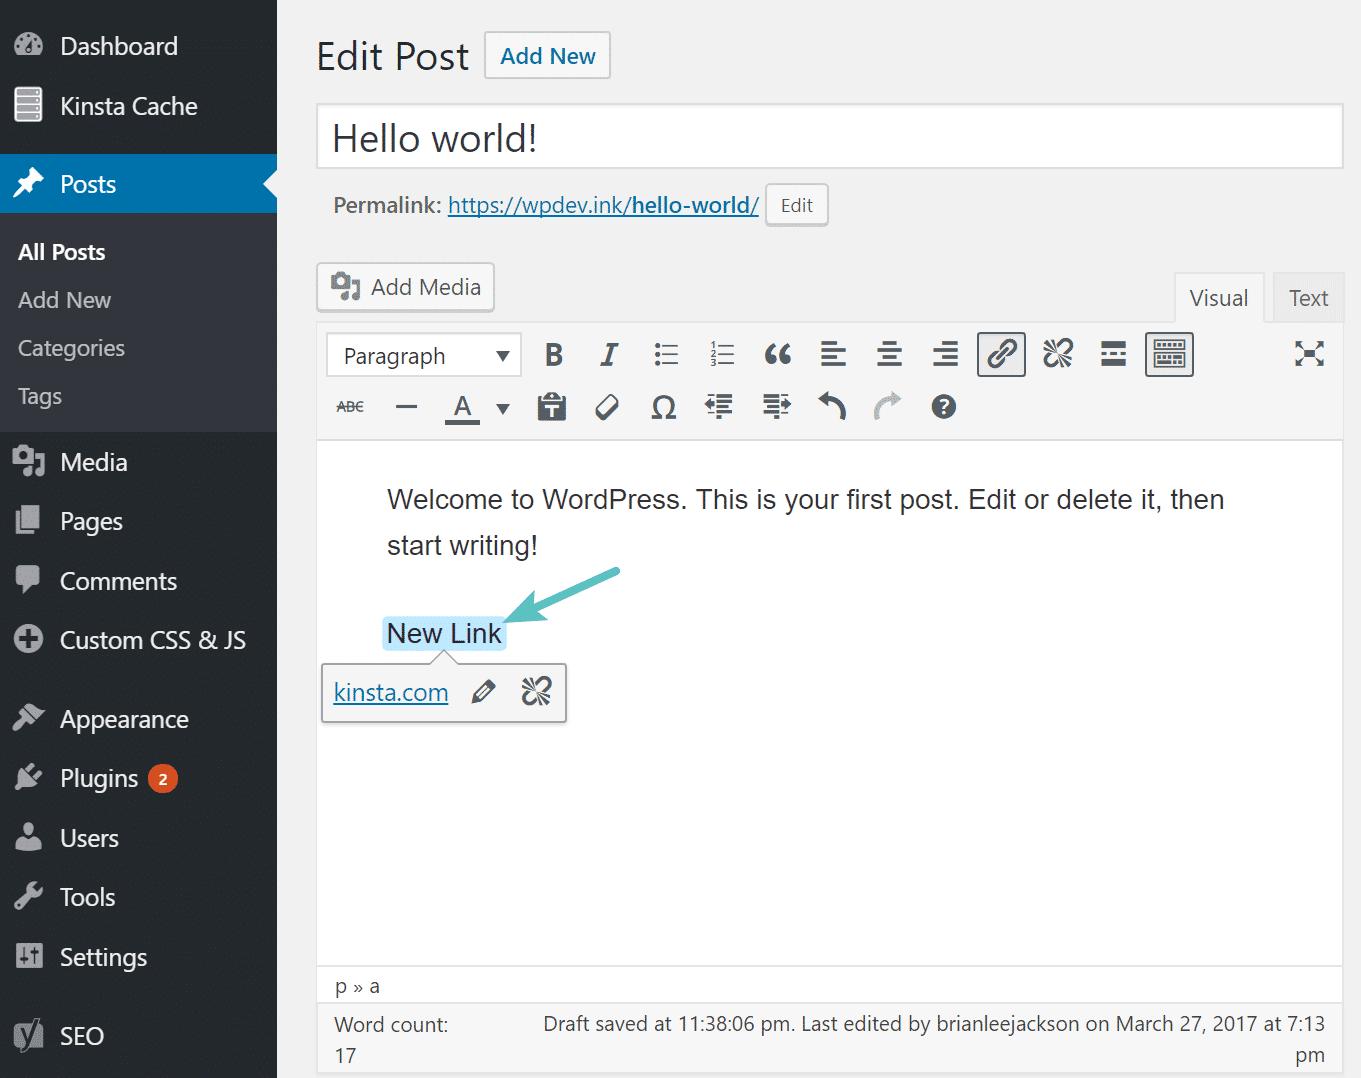 WordPress 4.8 limites do link